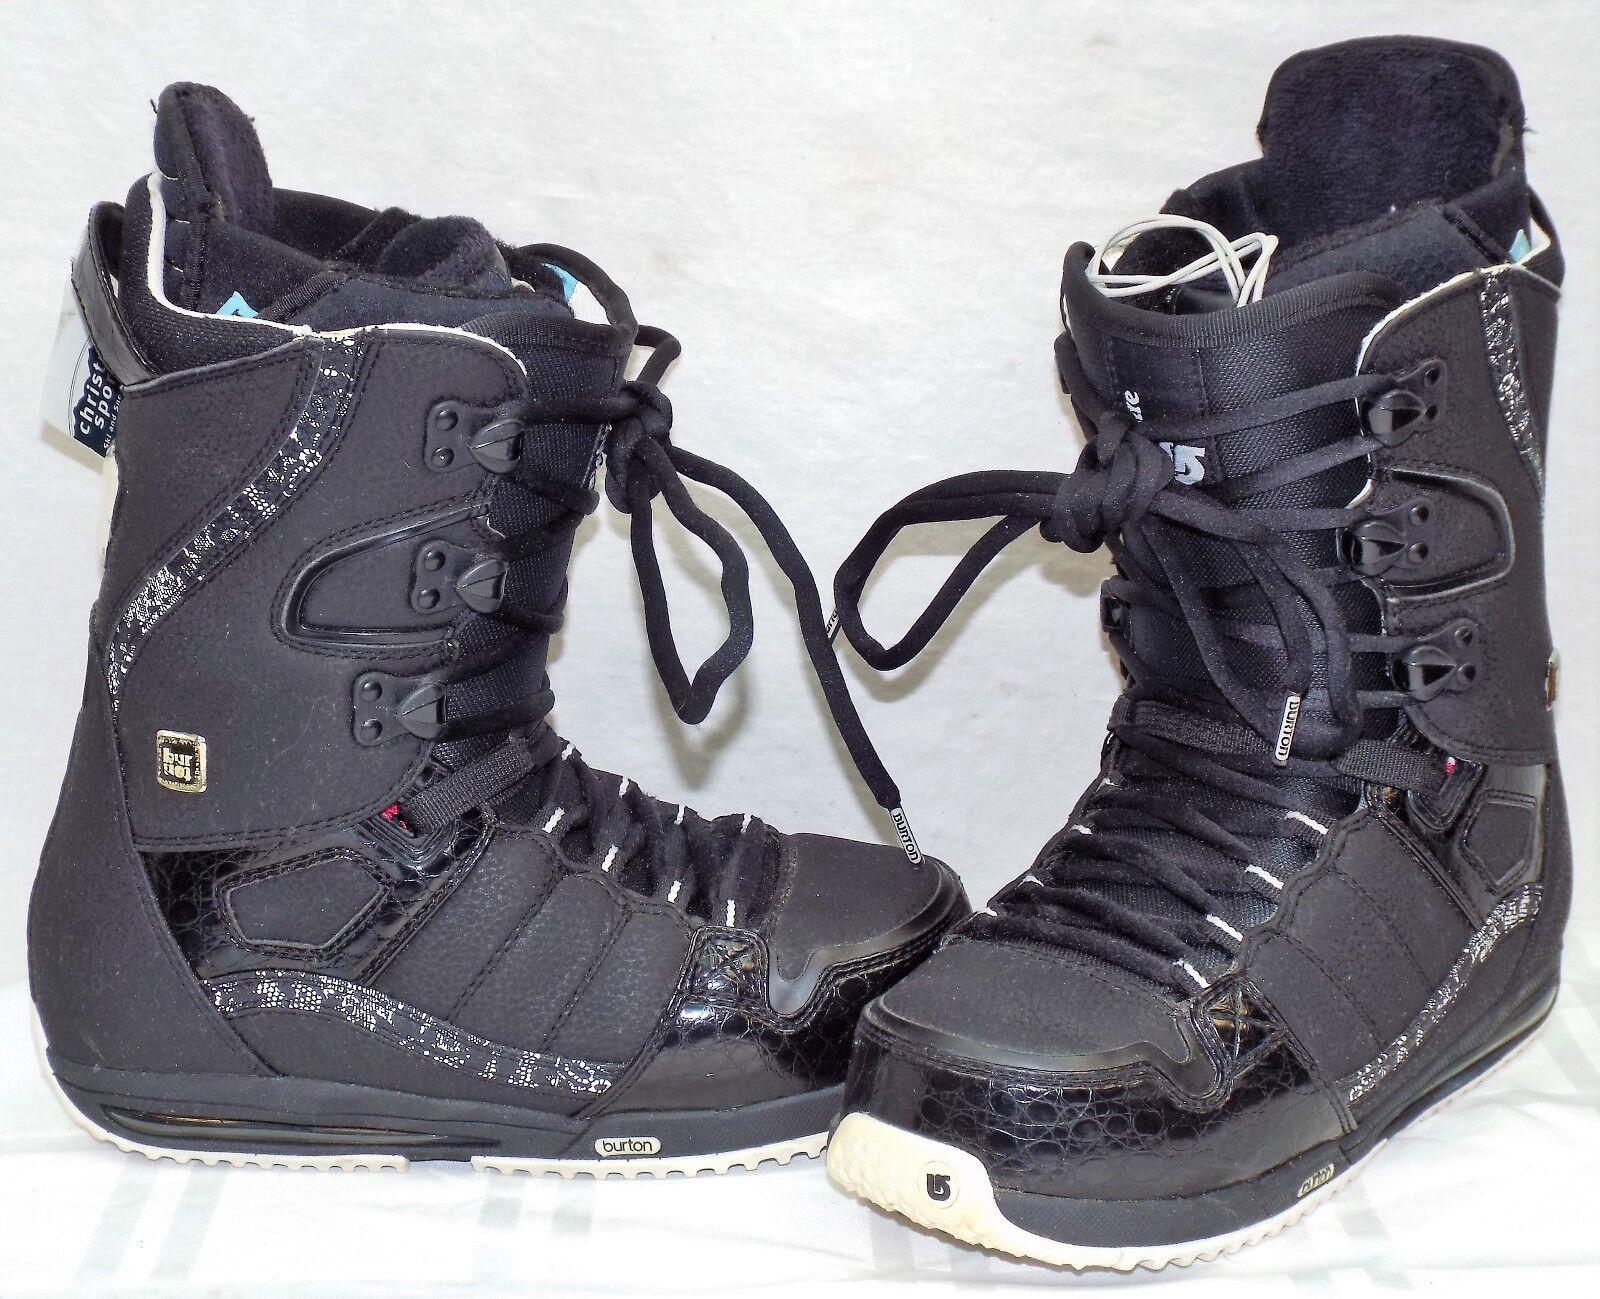 934b9fe6e174c Burton Sapphire Women s Snowboard Boots Size 7.5 Used nomtak4555 ...